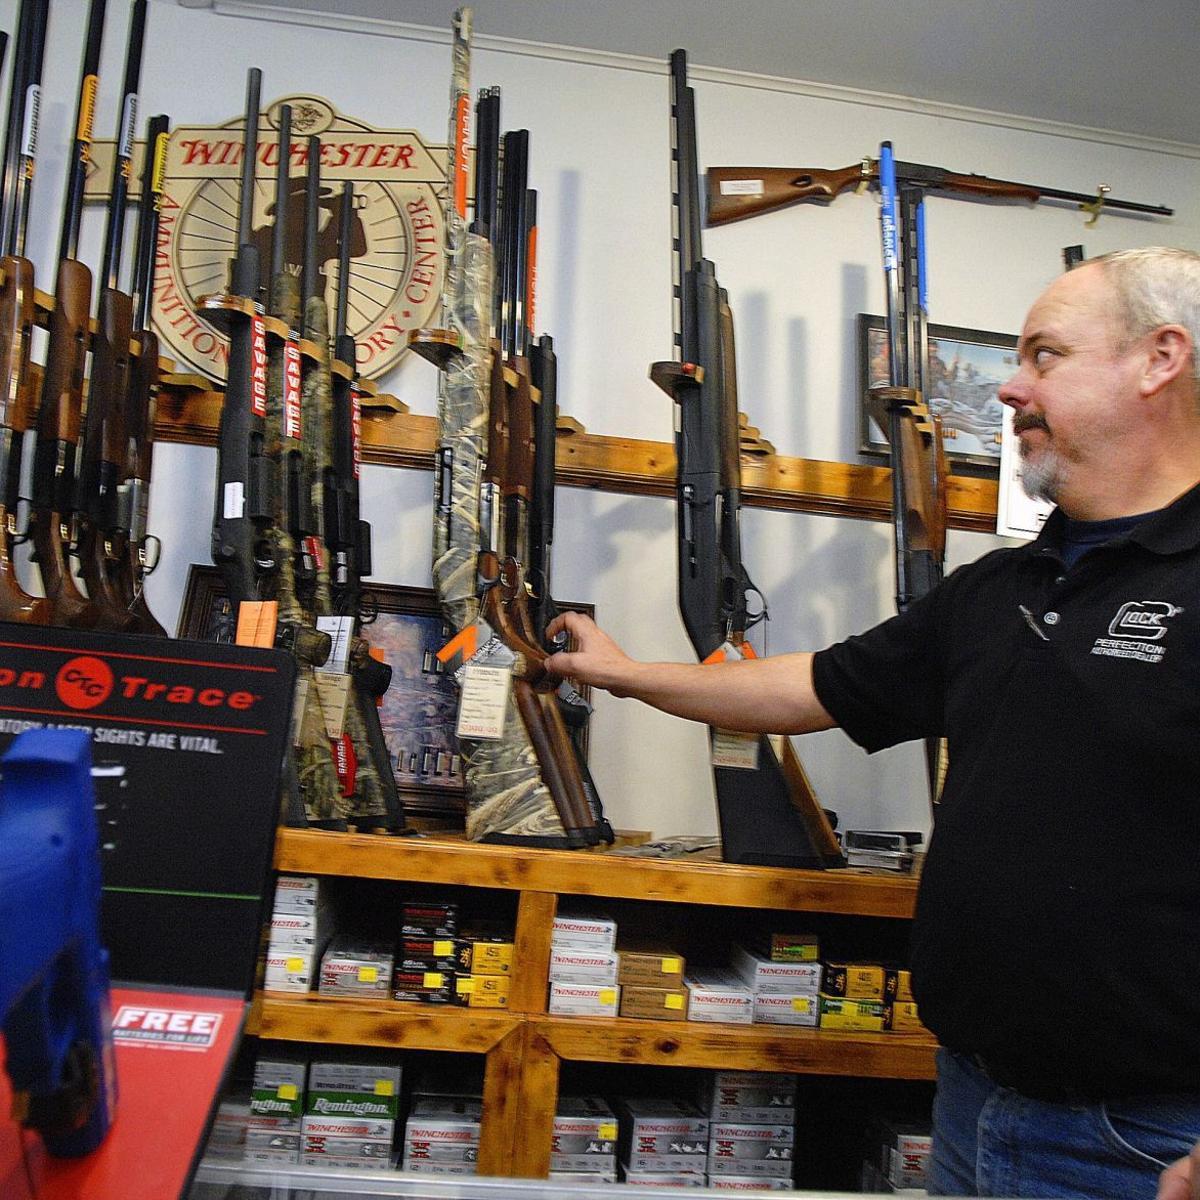 Supporters 'celebrating' new Illinois gun law